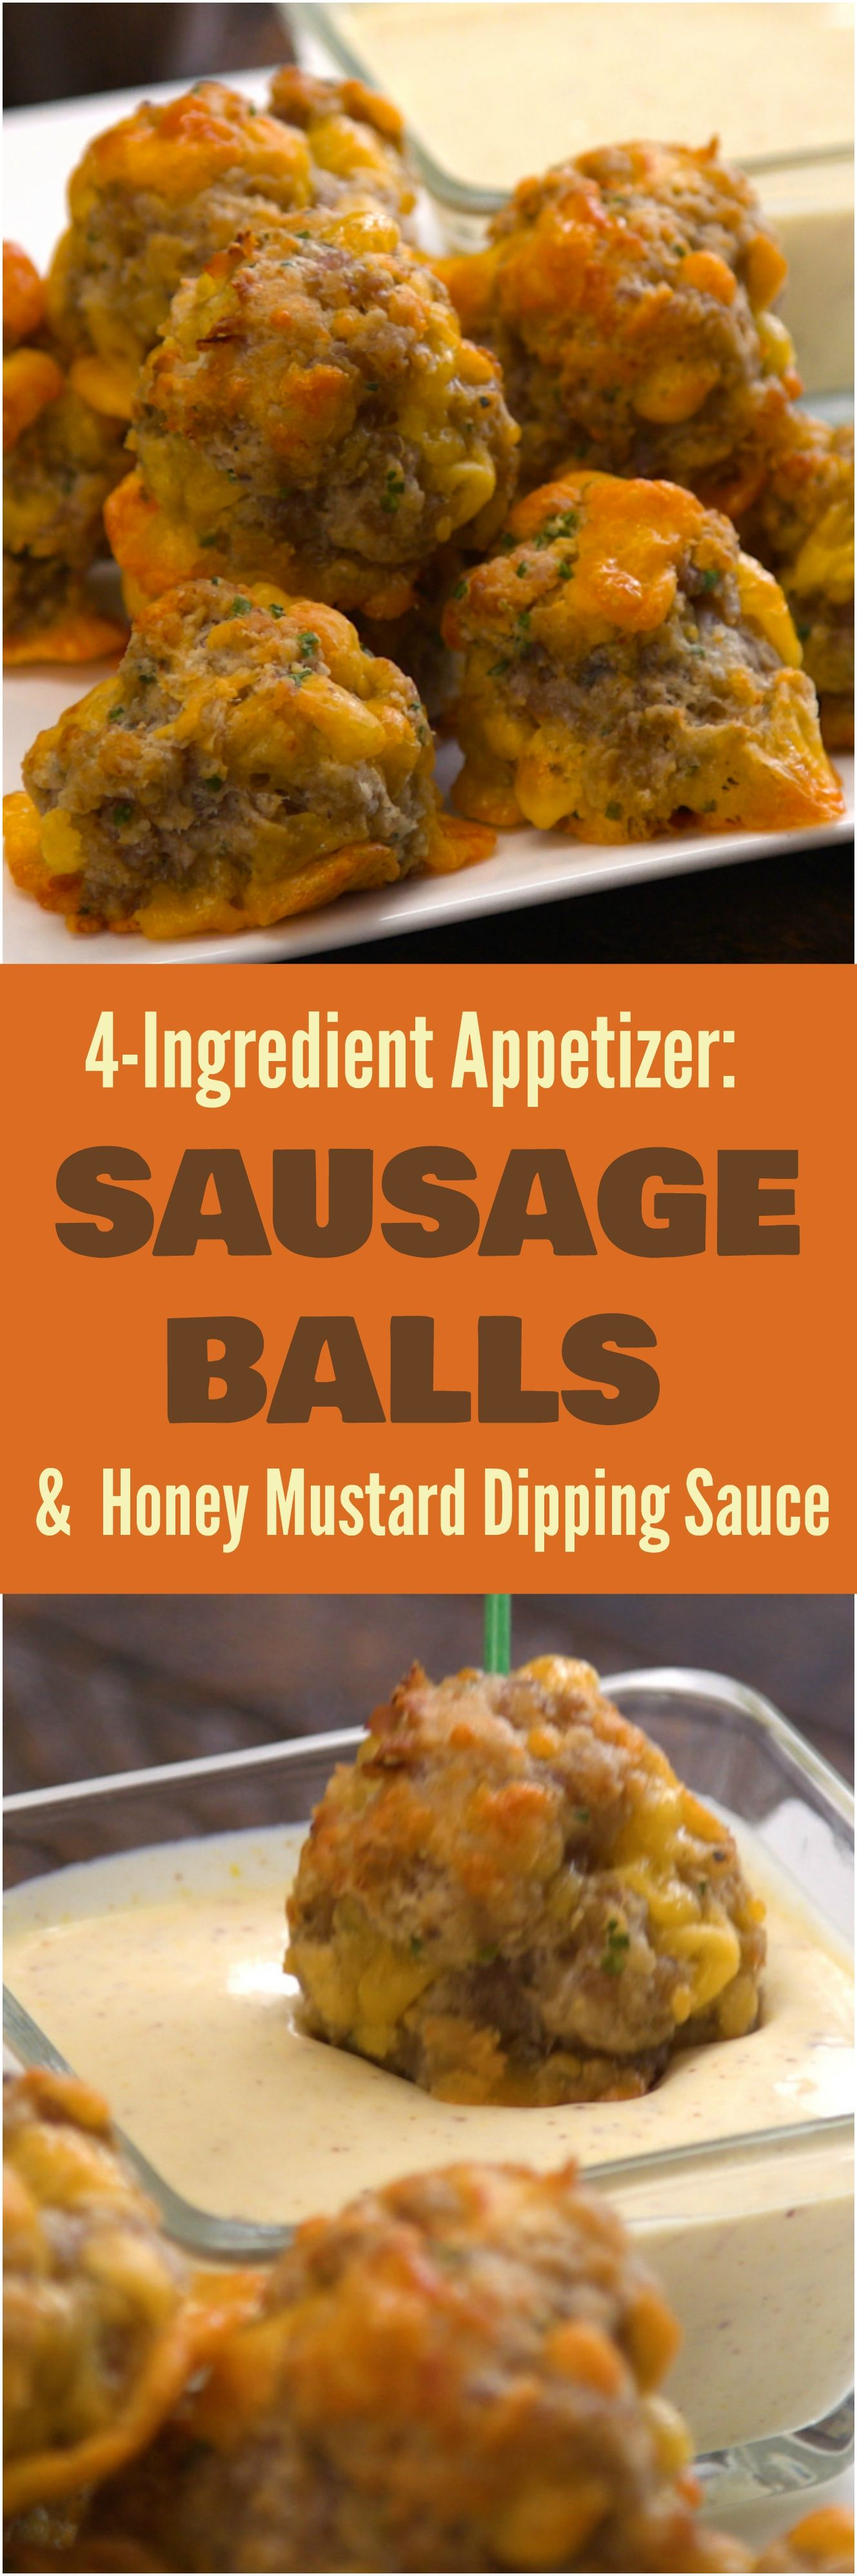 Sausage Balls with Creamy Honey Mustard Dipping Sauce